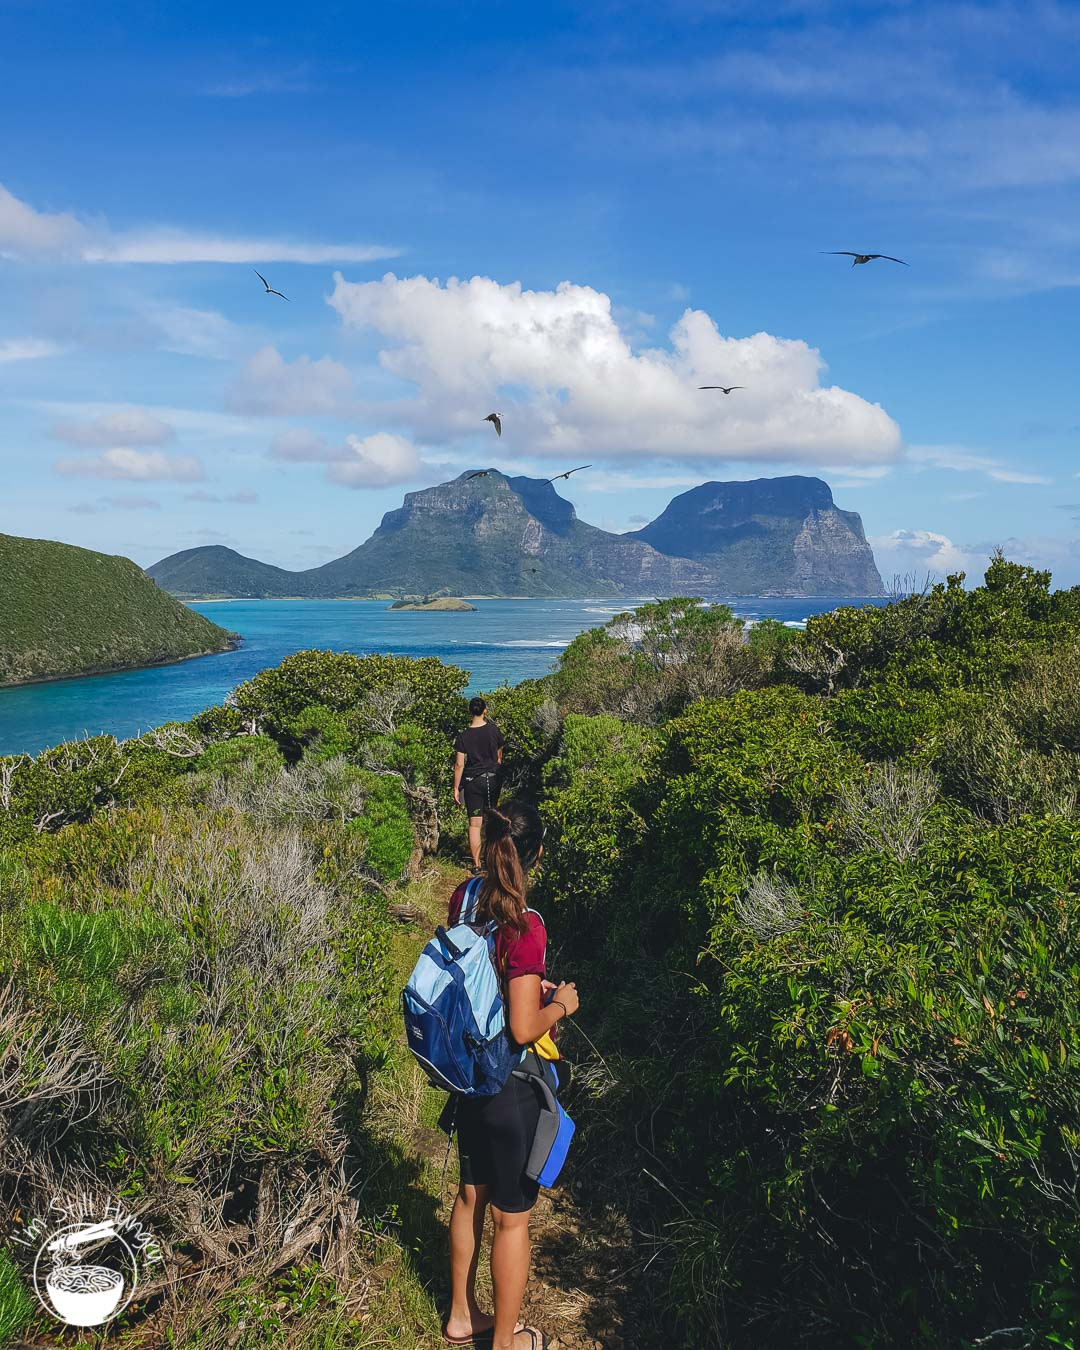 Lord Howe Island Beaches: Australia's Pristine Paradise